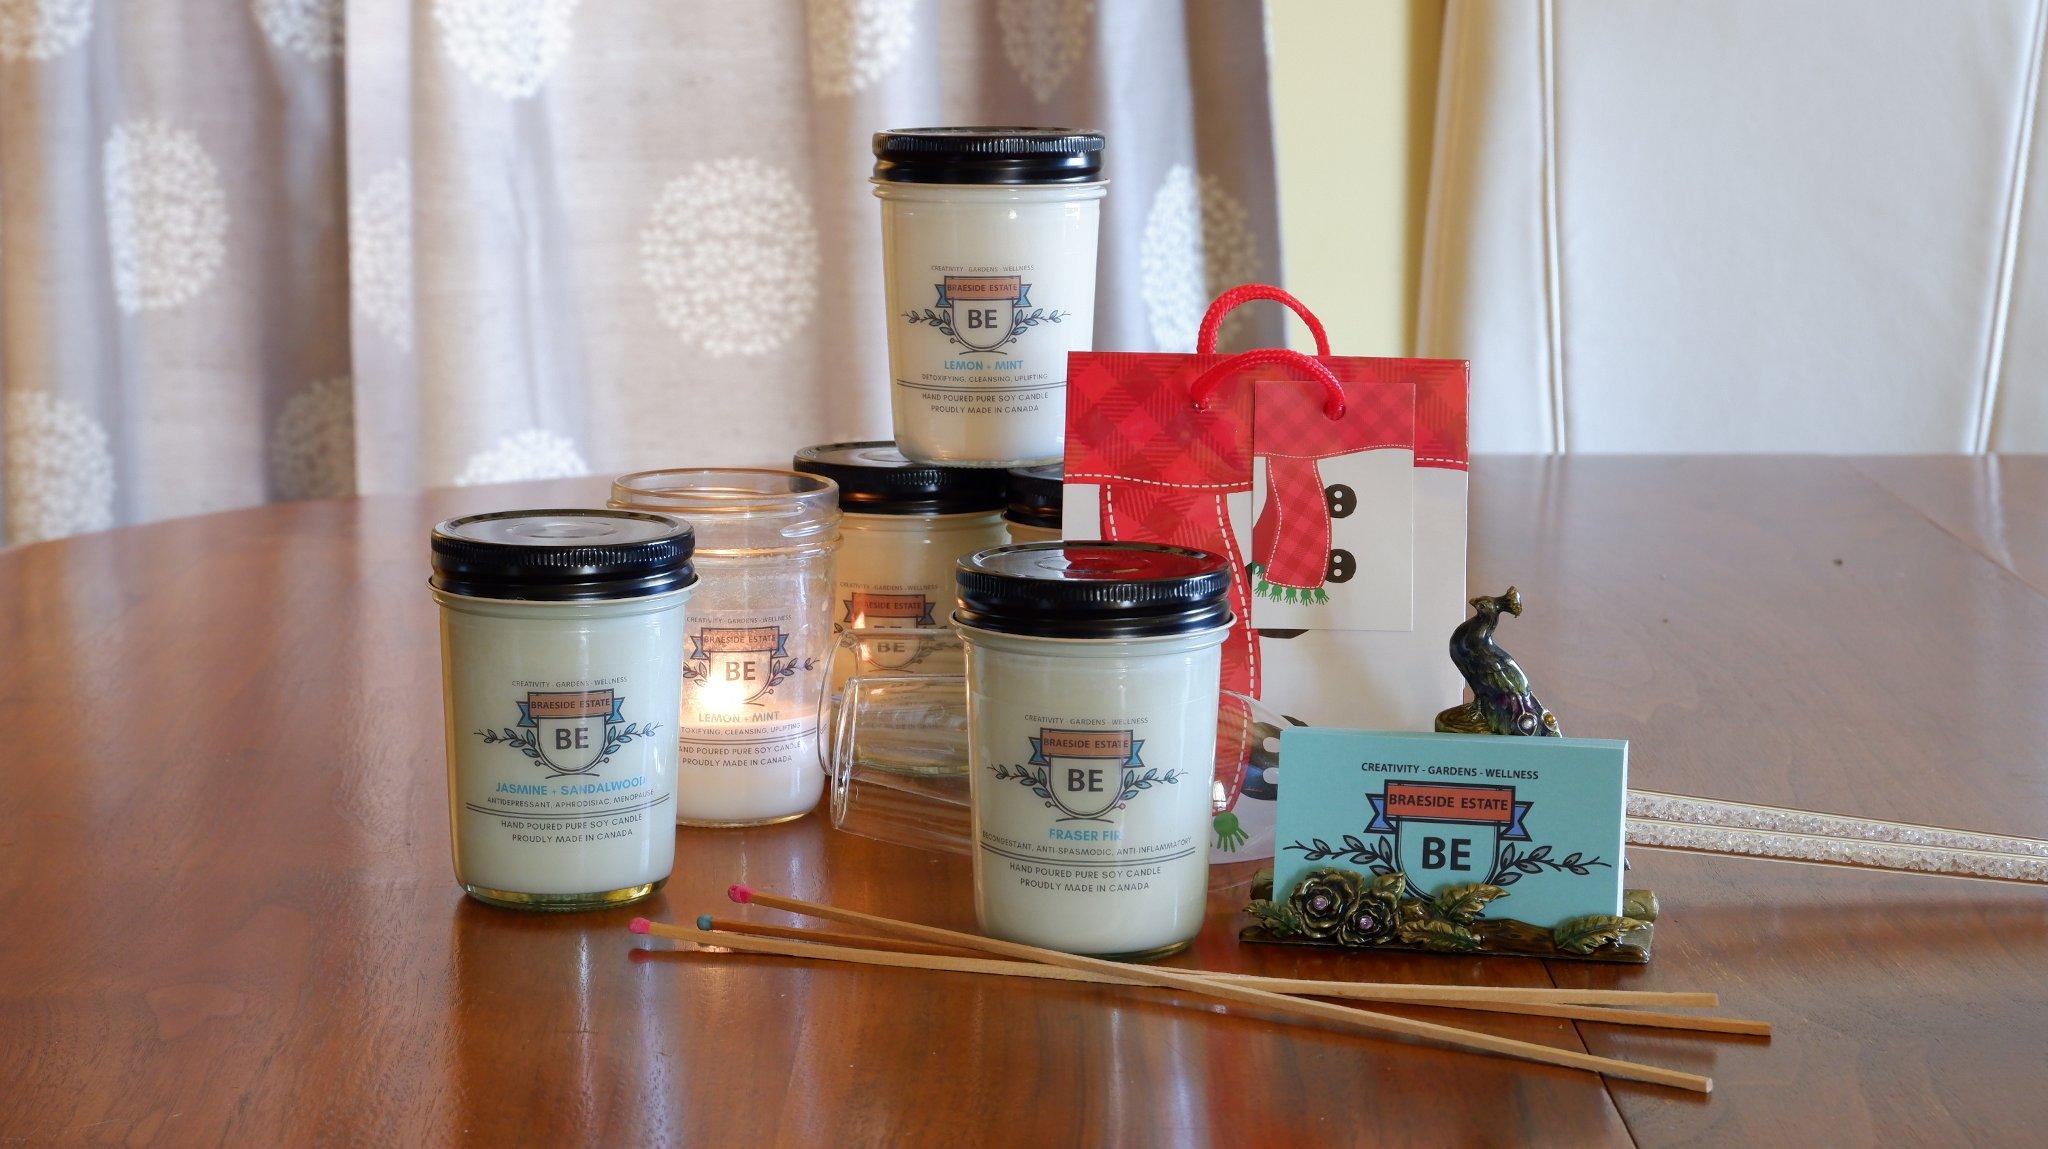 Braeside Estate Aromatherapy Candles